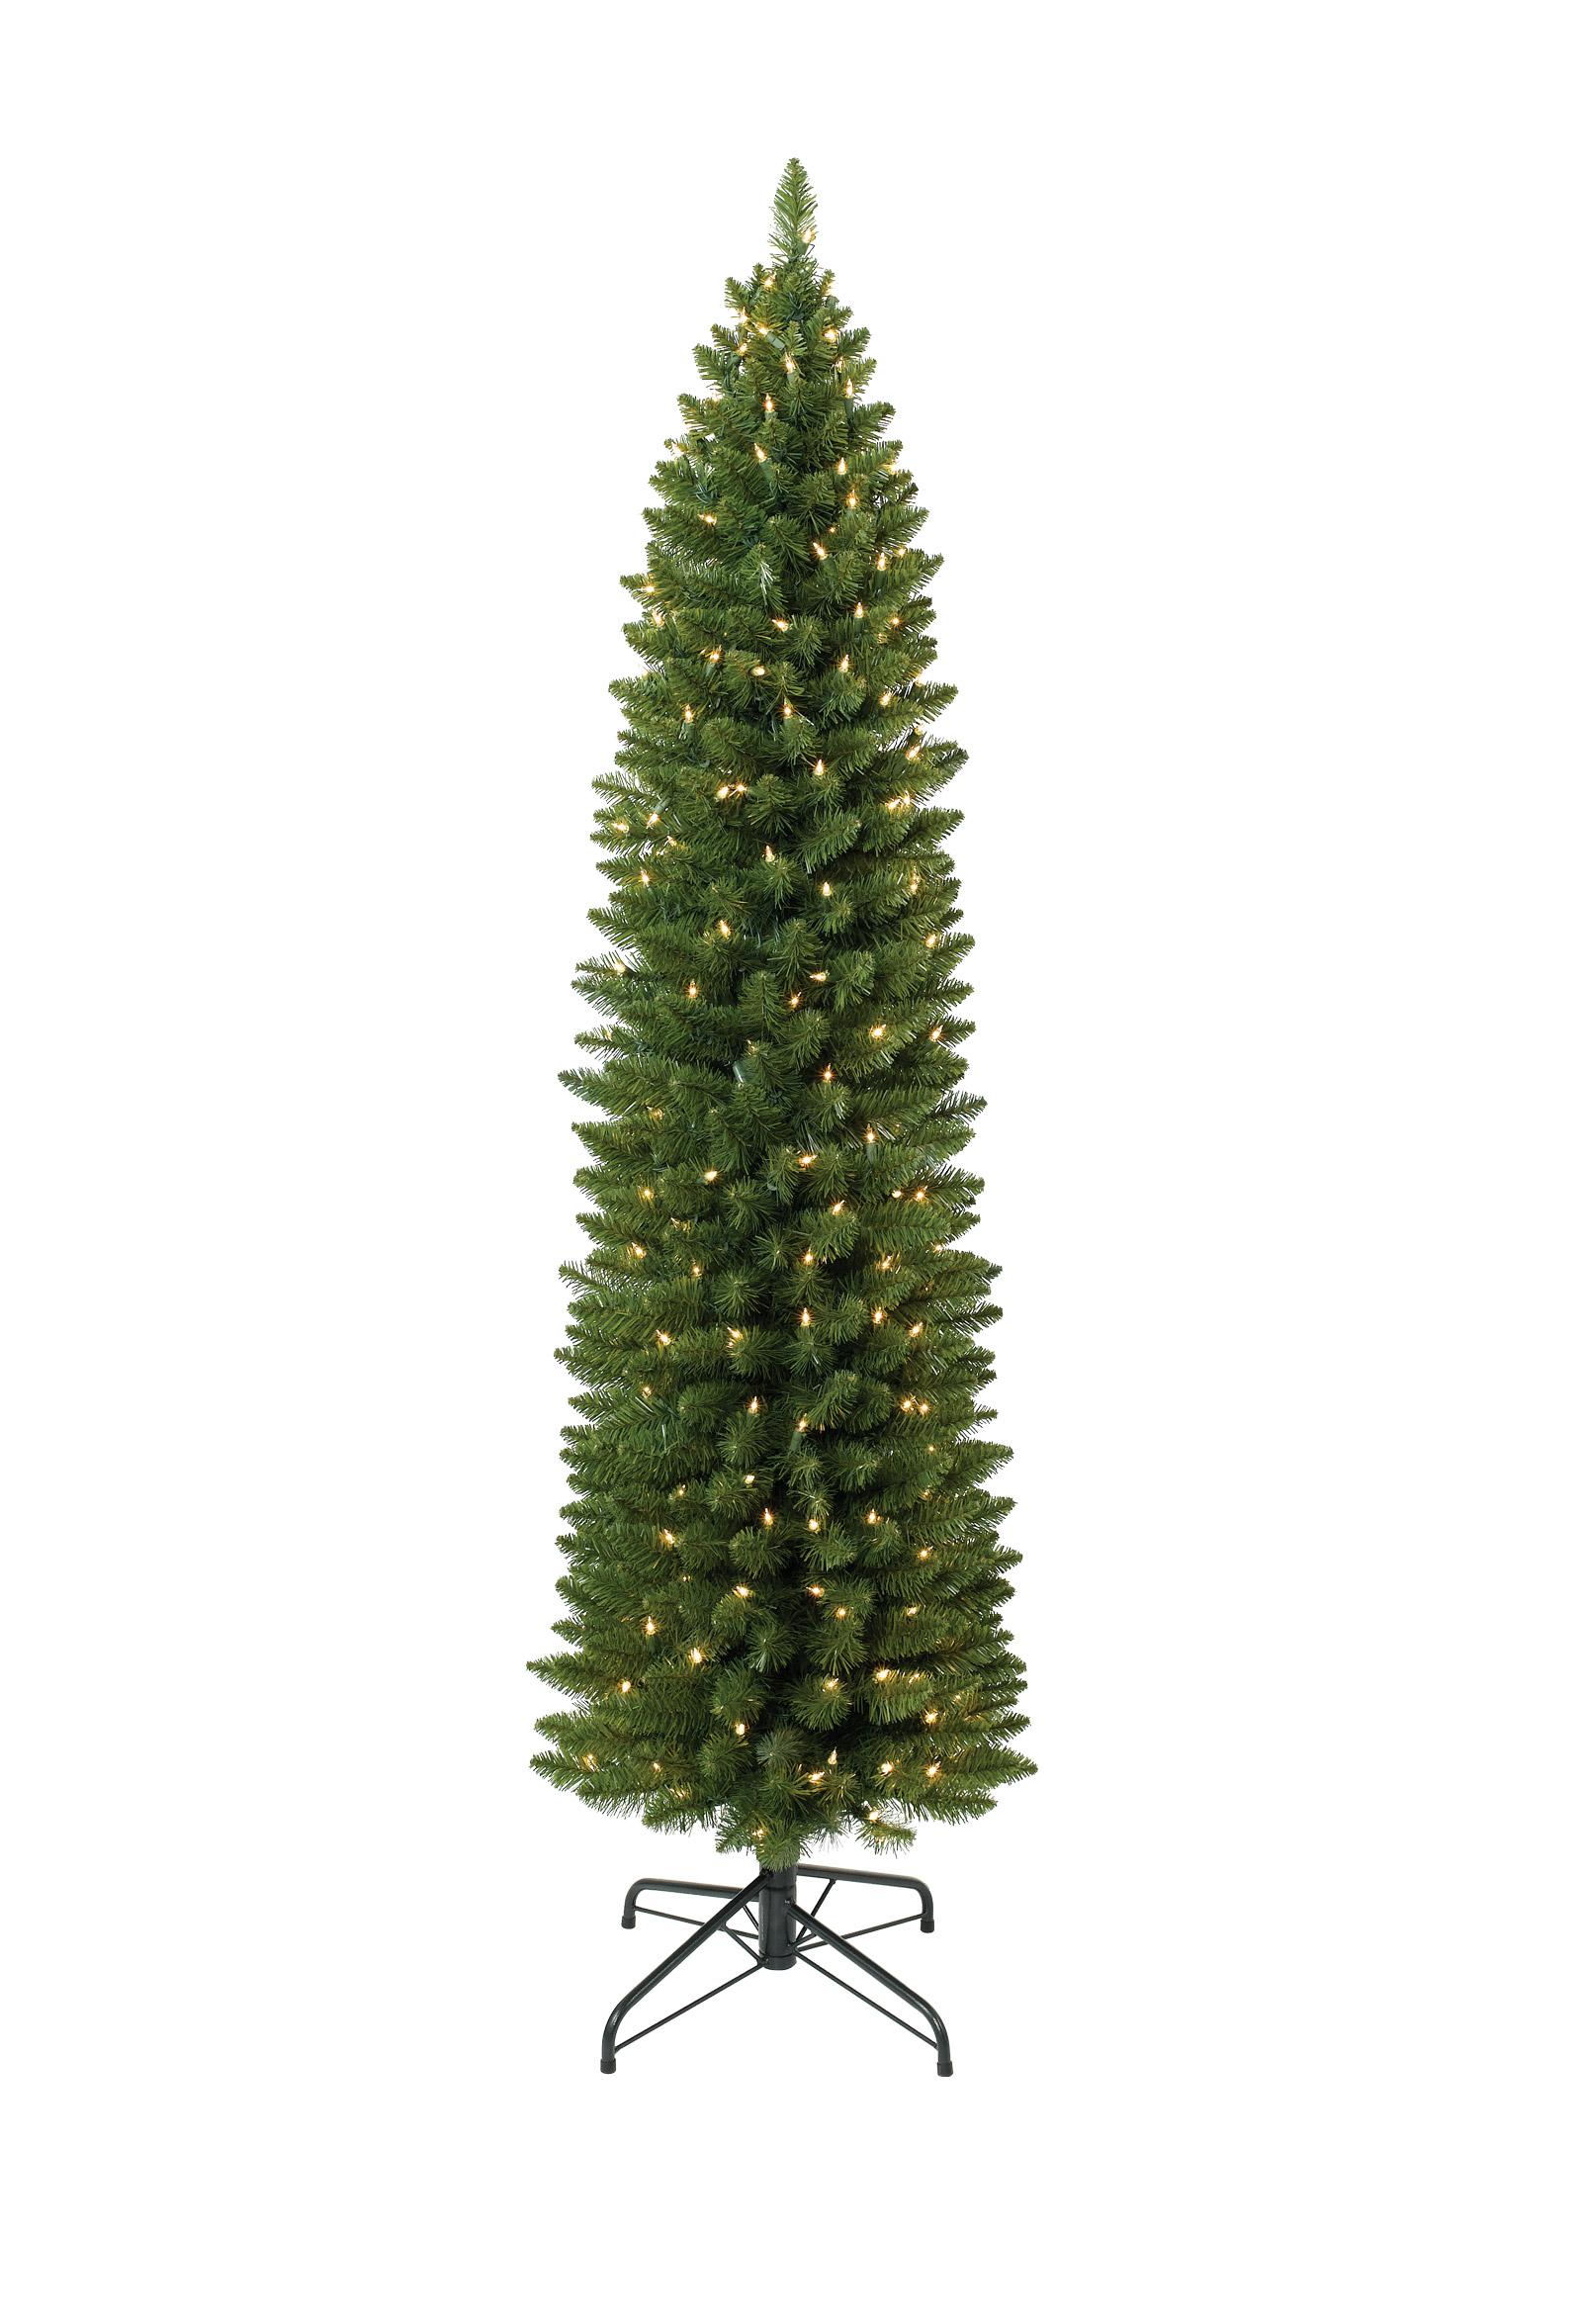 Slim Ticonderoga Pencil Christmas Trees - Christmas Tree Market